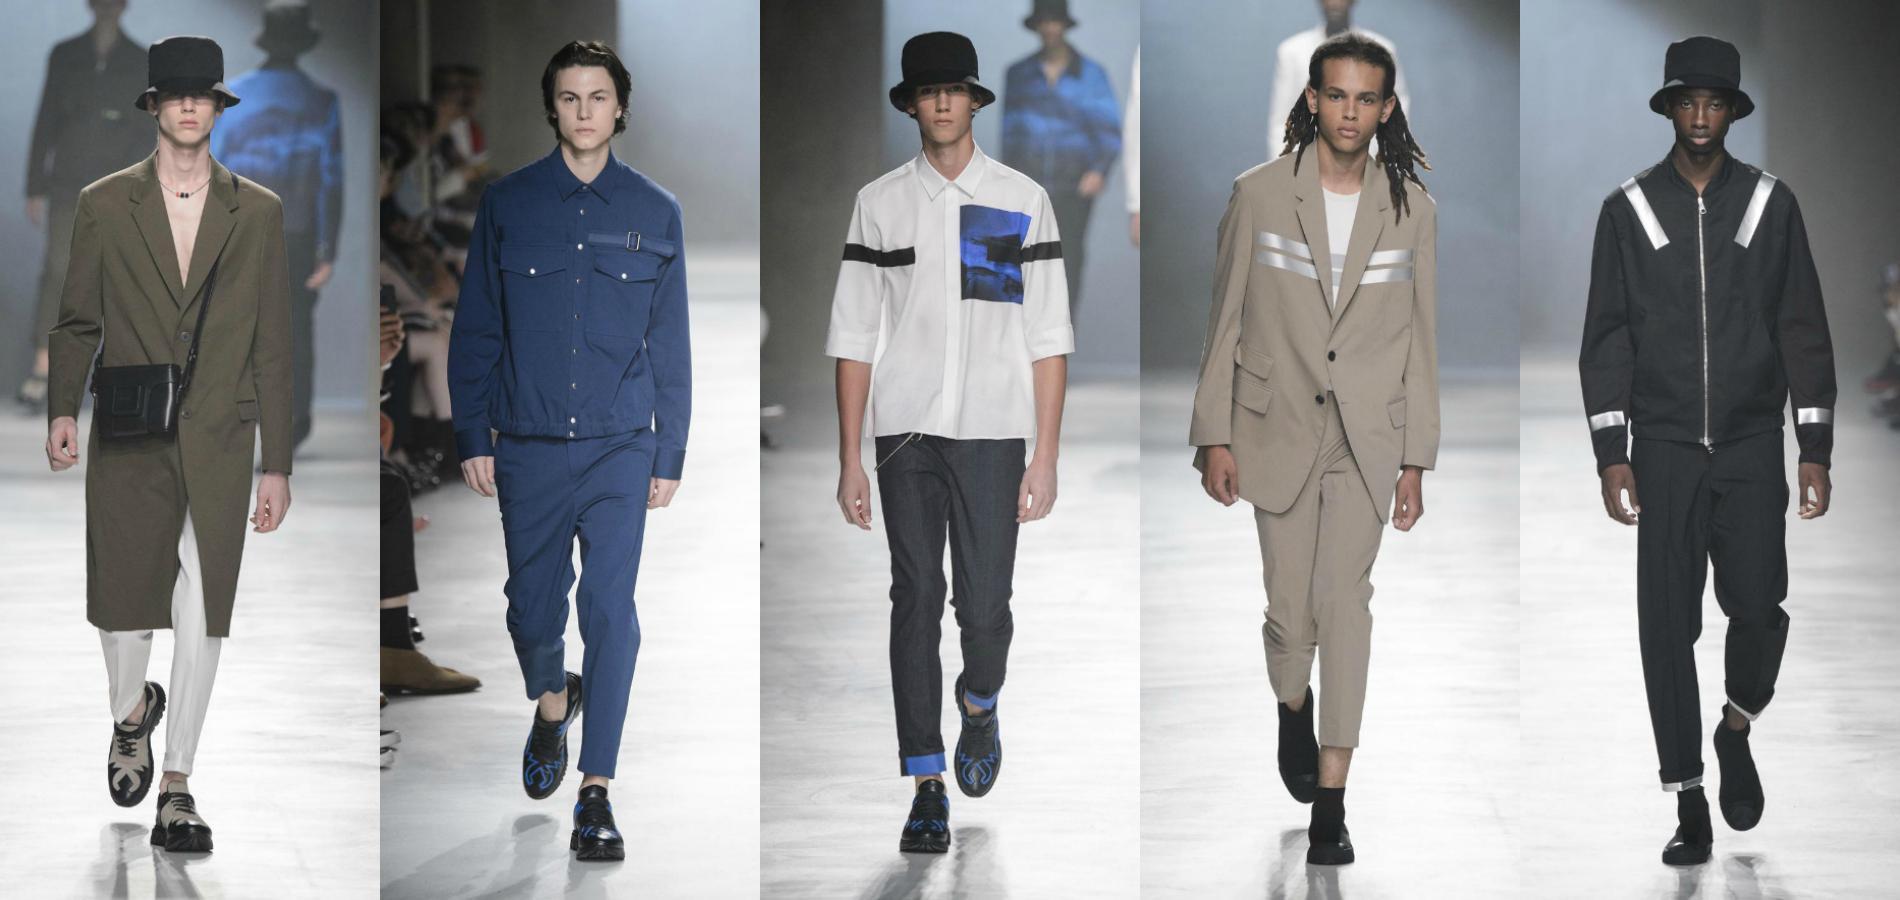 Défilé Neil Barrett, Fashion Week Printemps été 2018 de Milan. ade9a9955ef